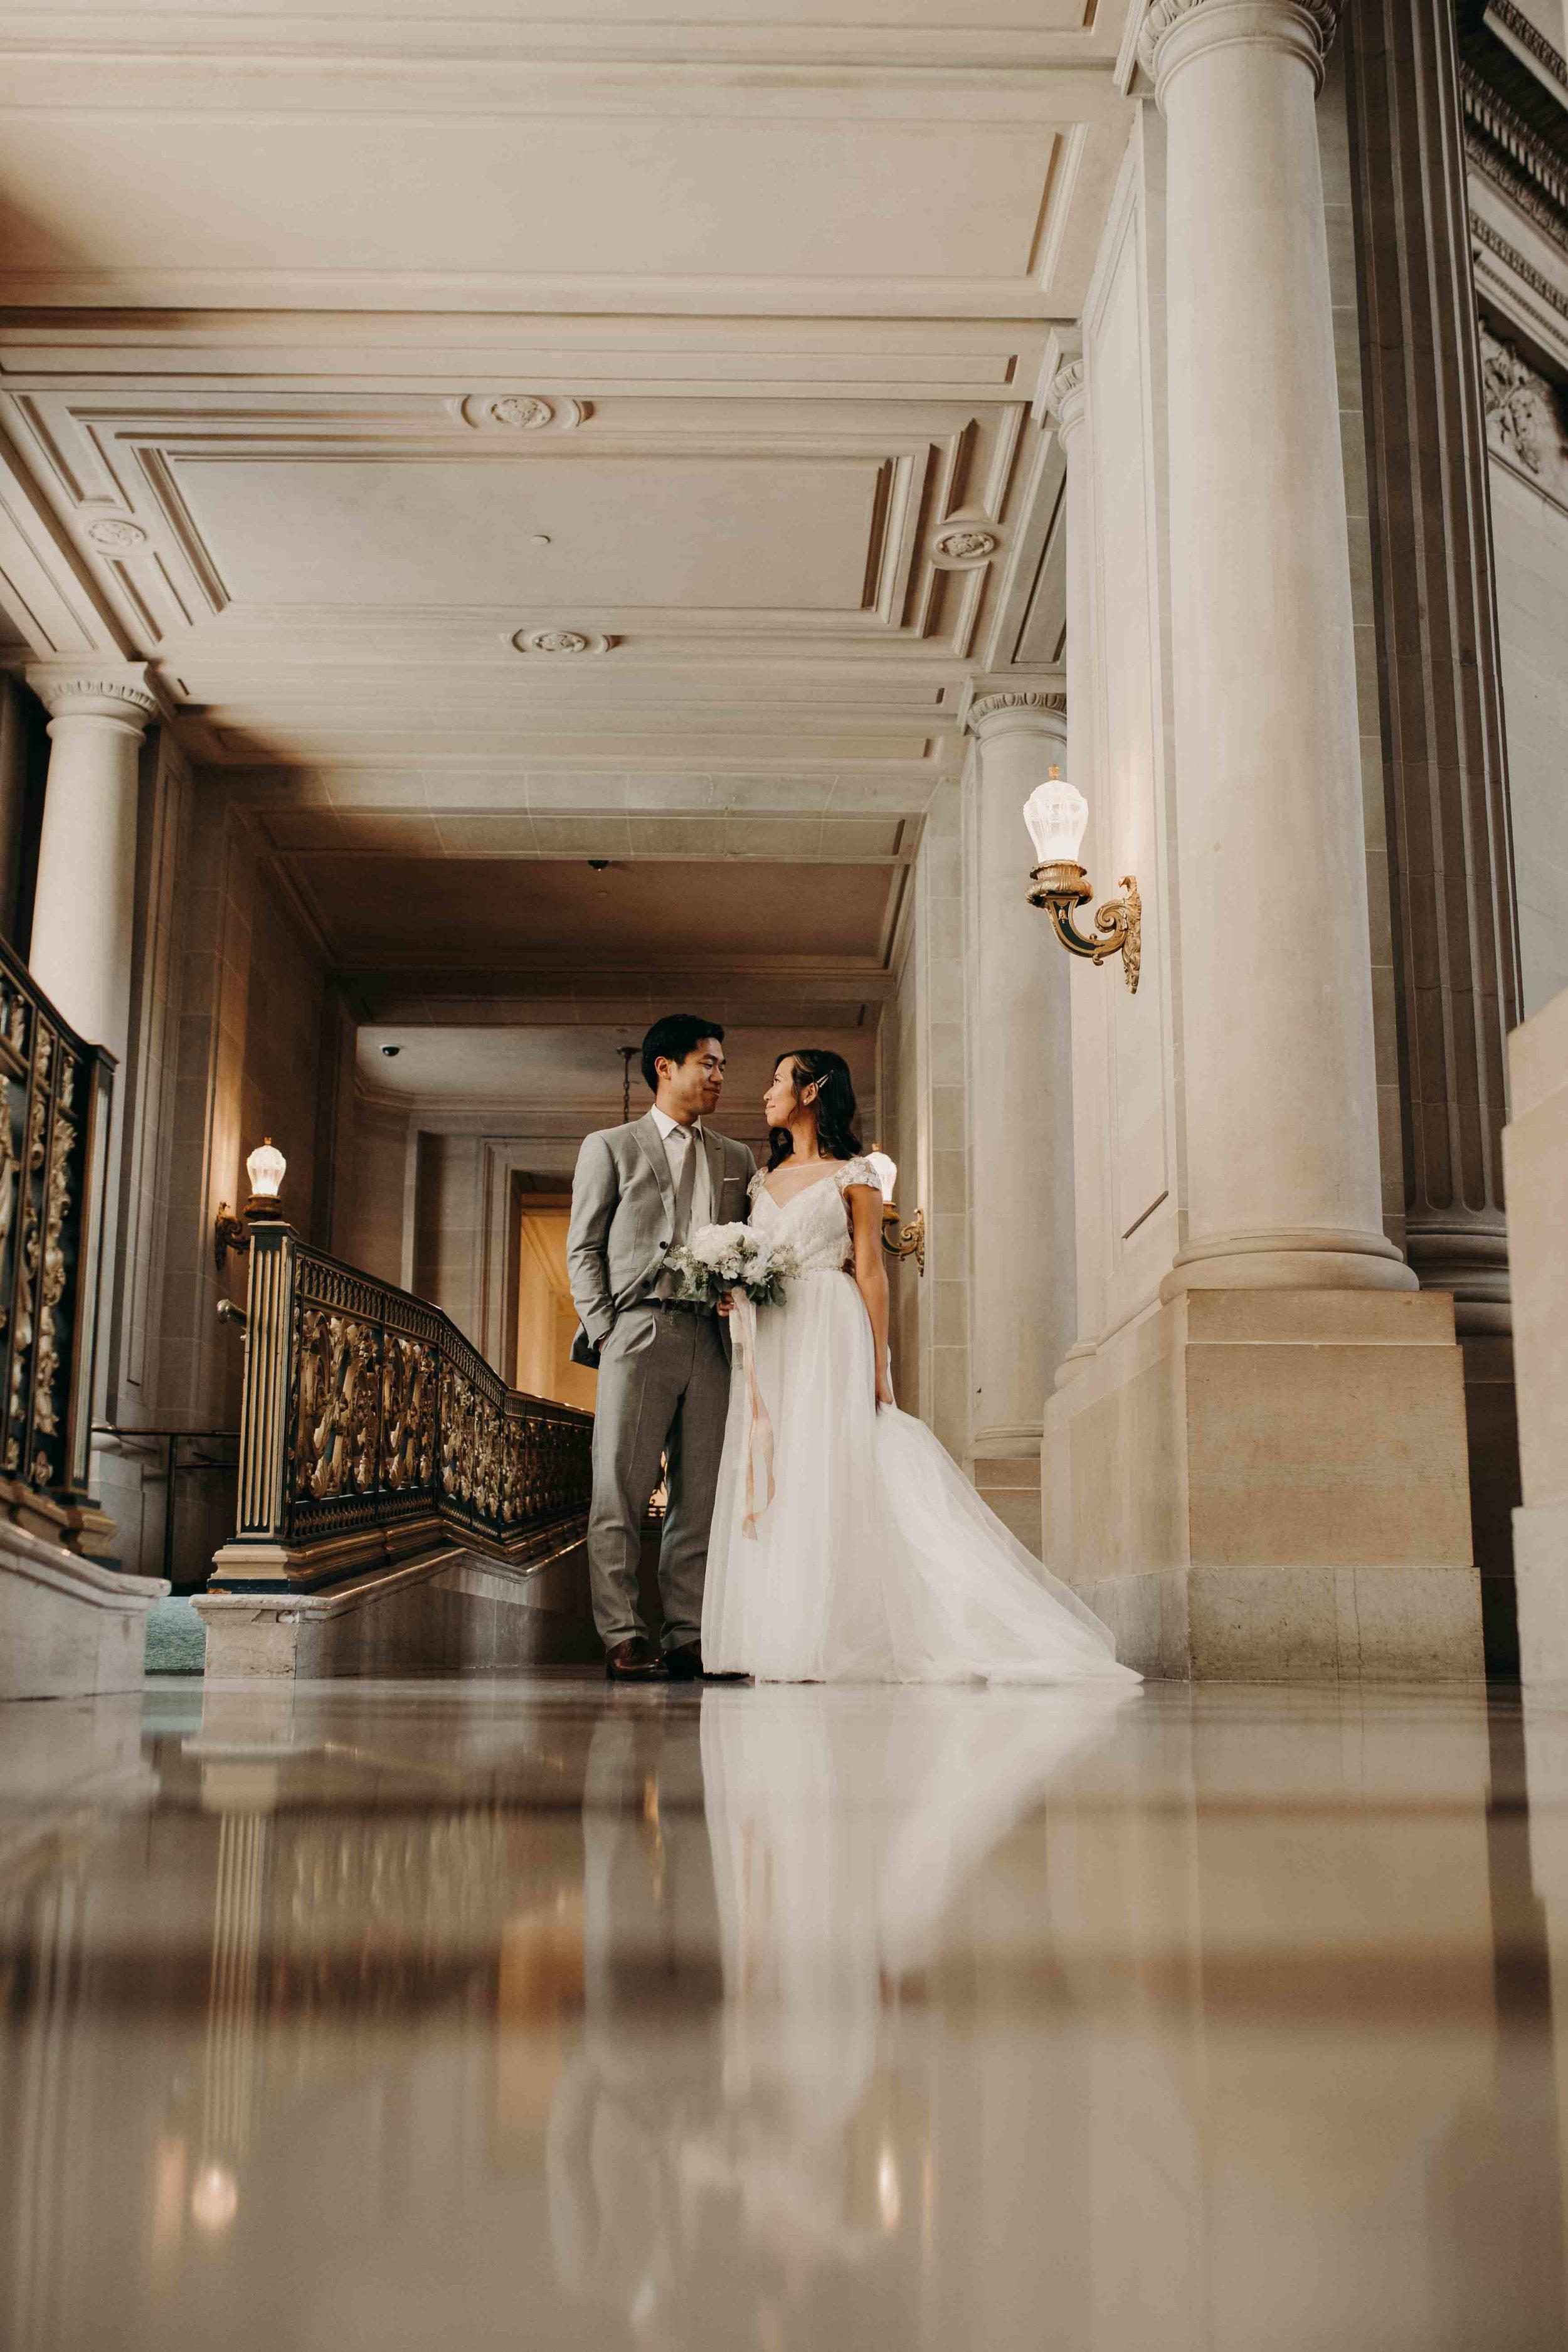 weddingday (17 of 67).jpg